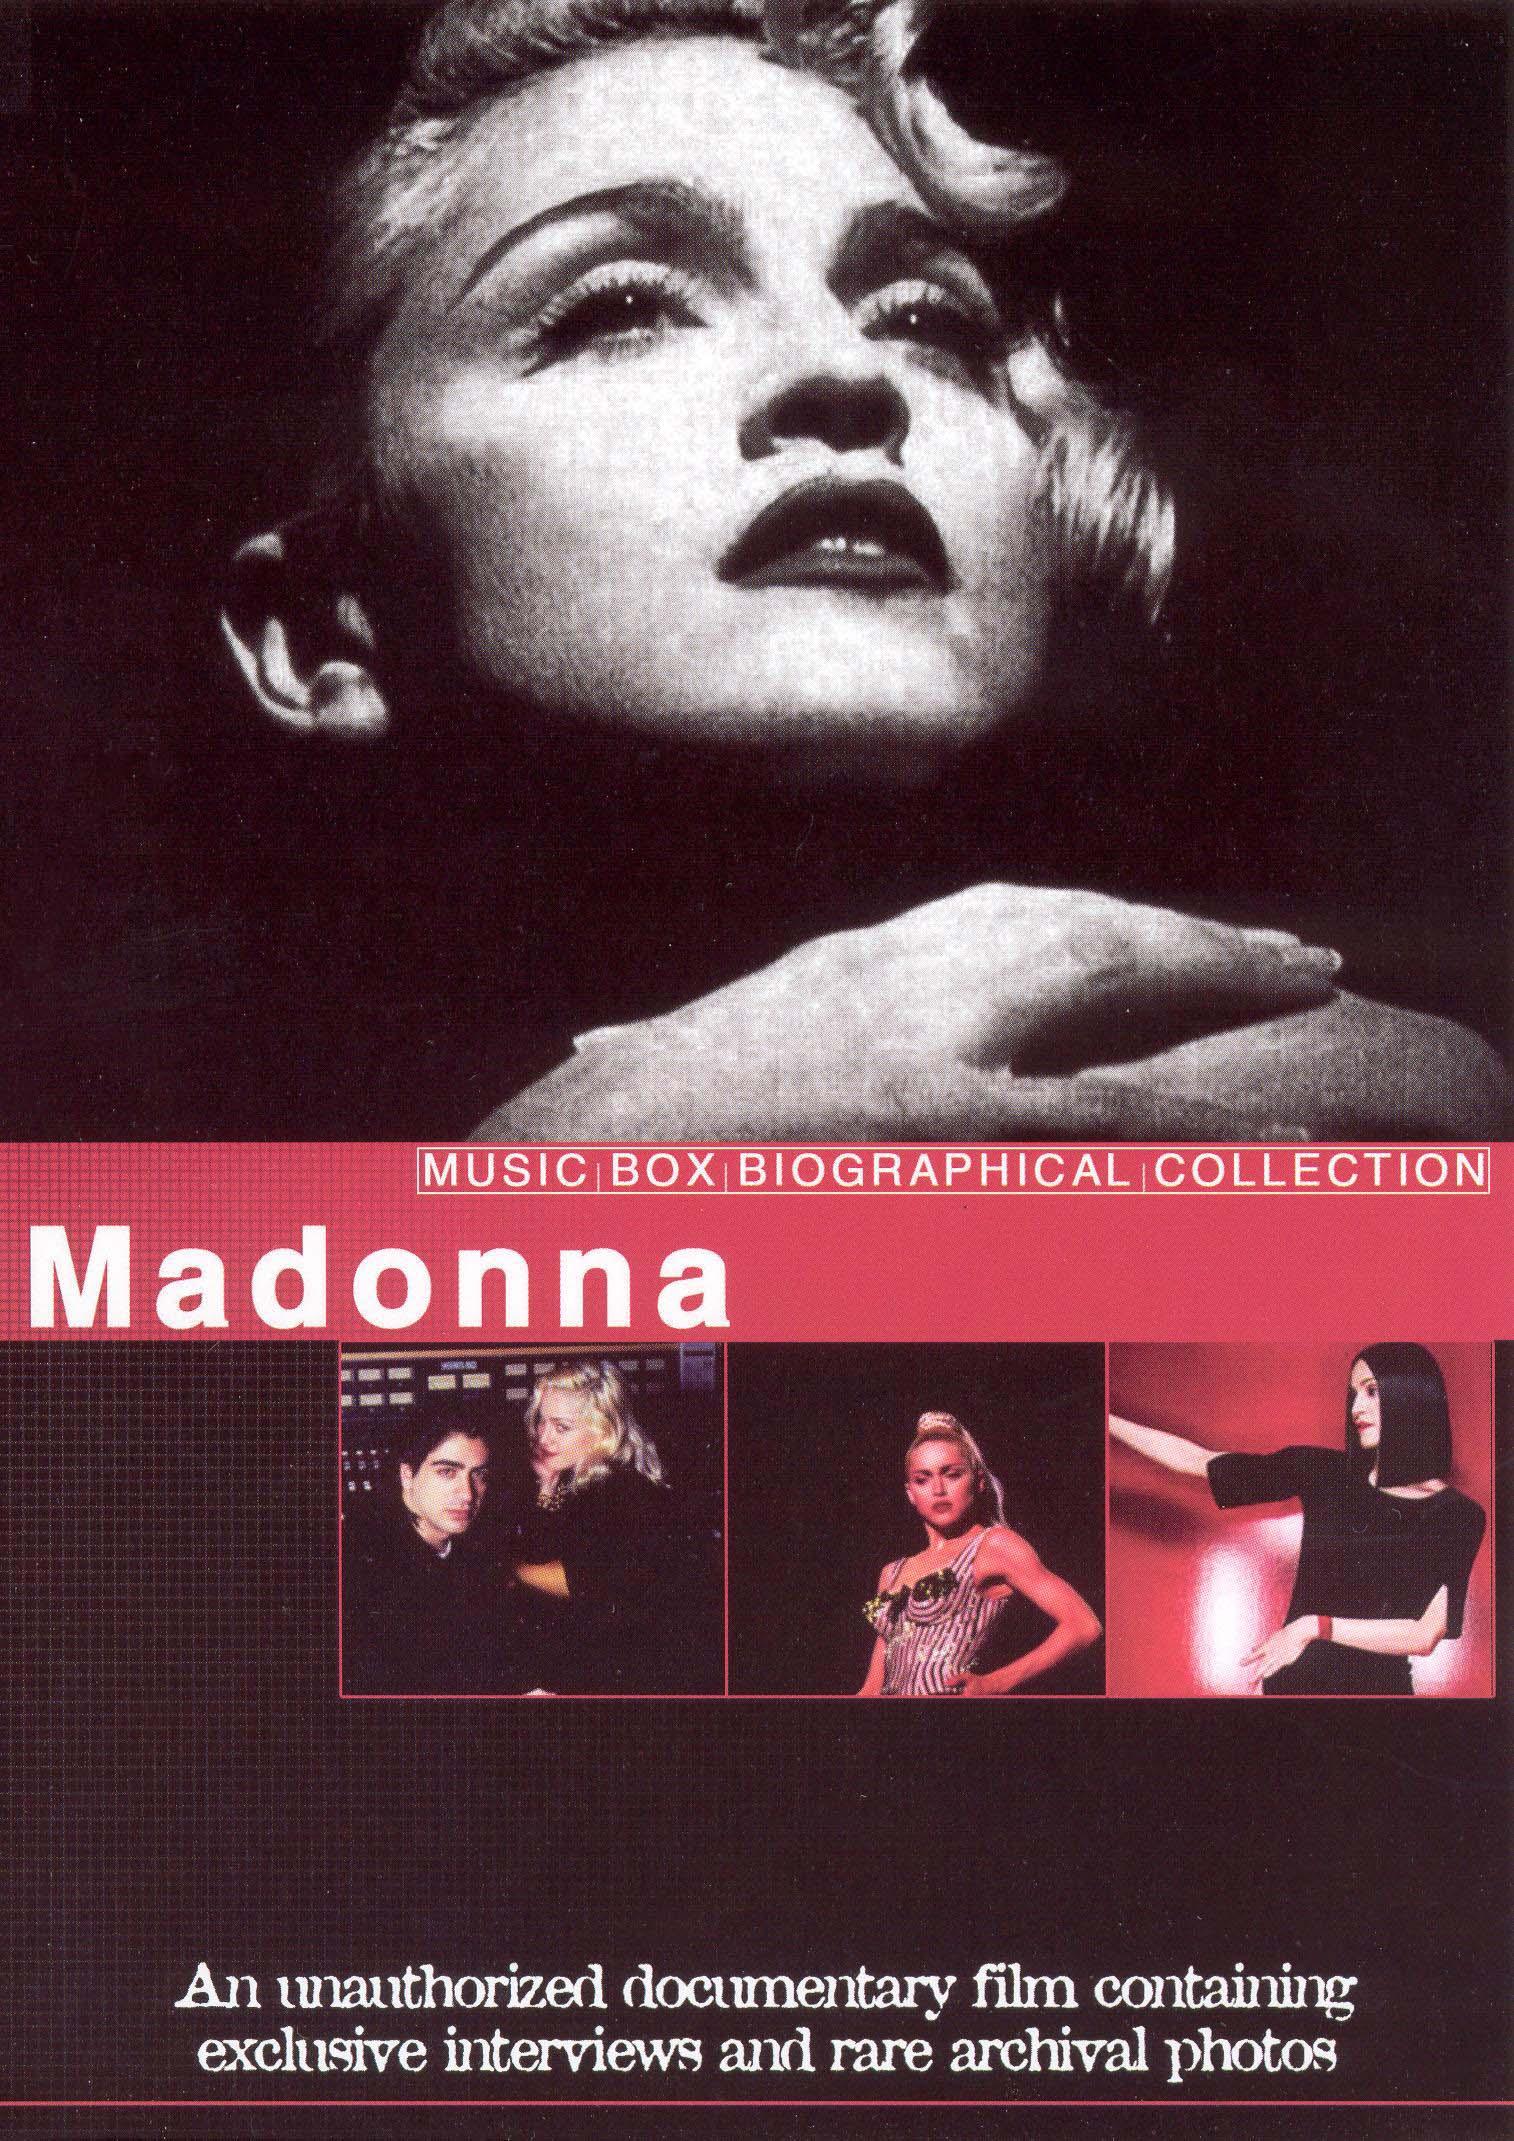 Music Box Biographical Collection: Madonna